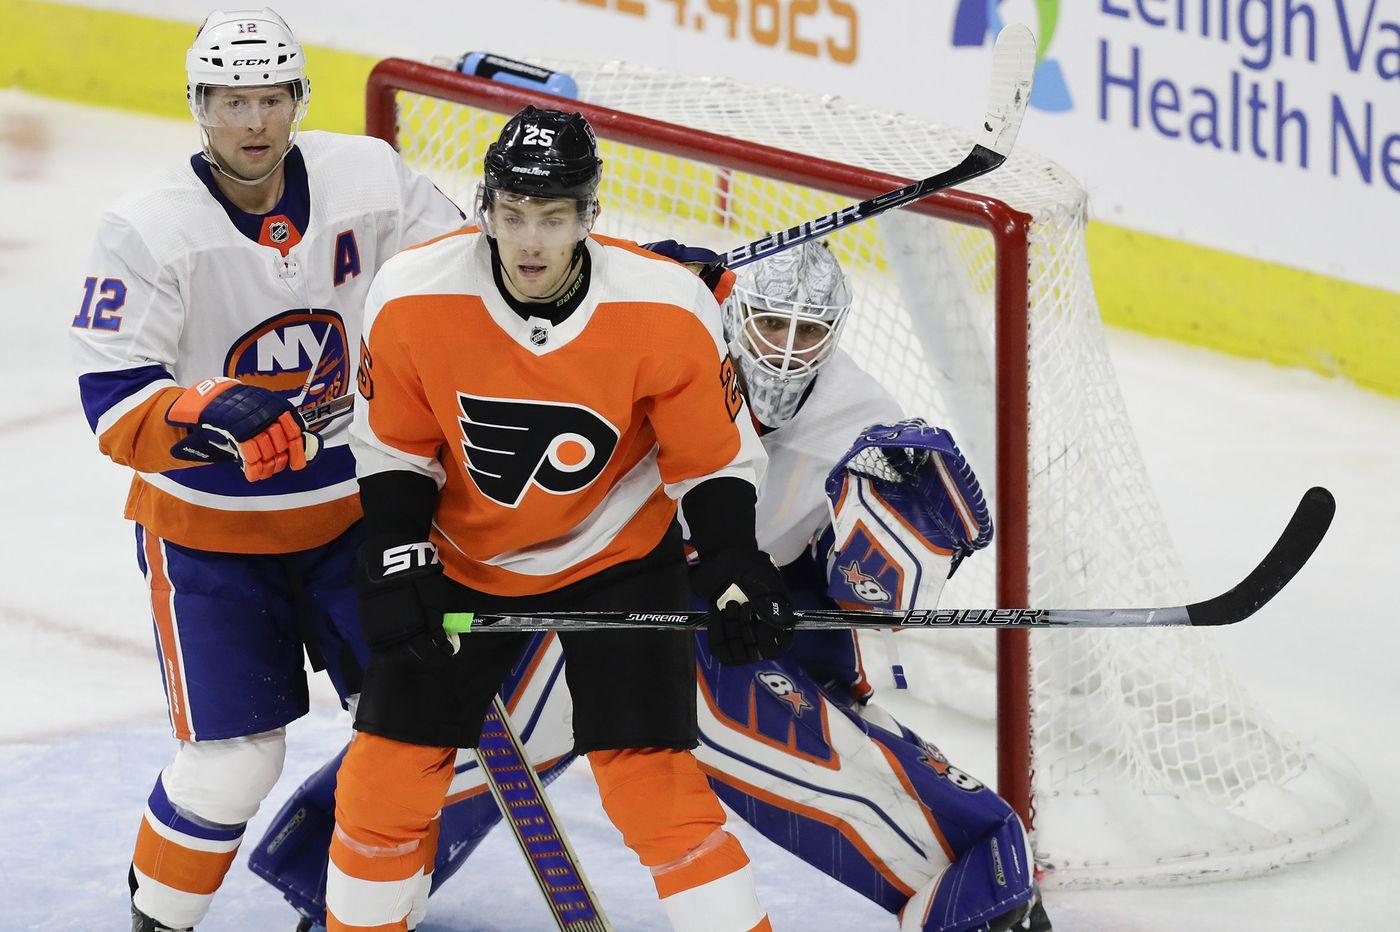 James van Riemsdyk almost ready to return to Flyers' lineup